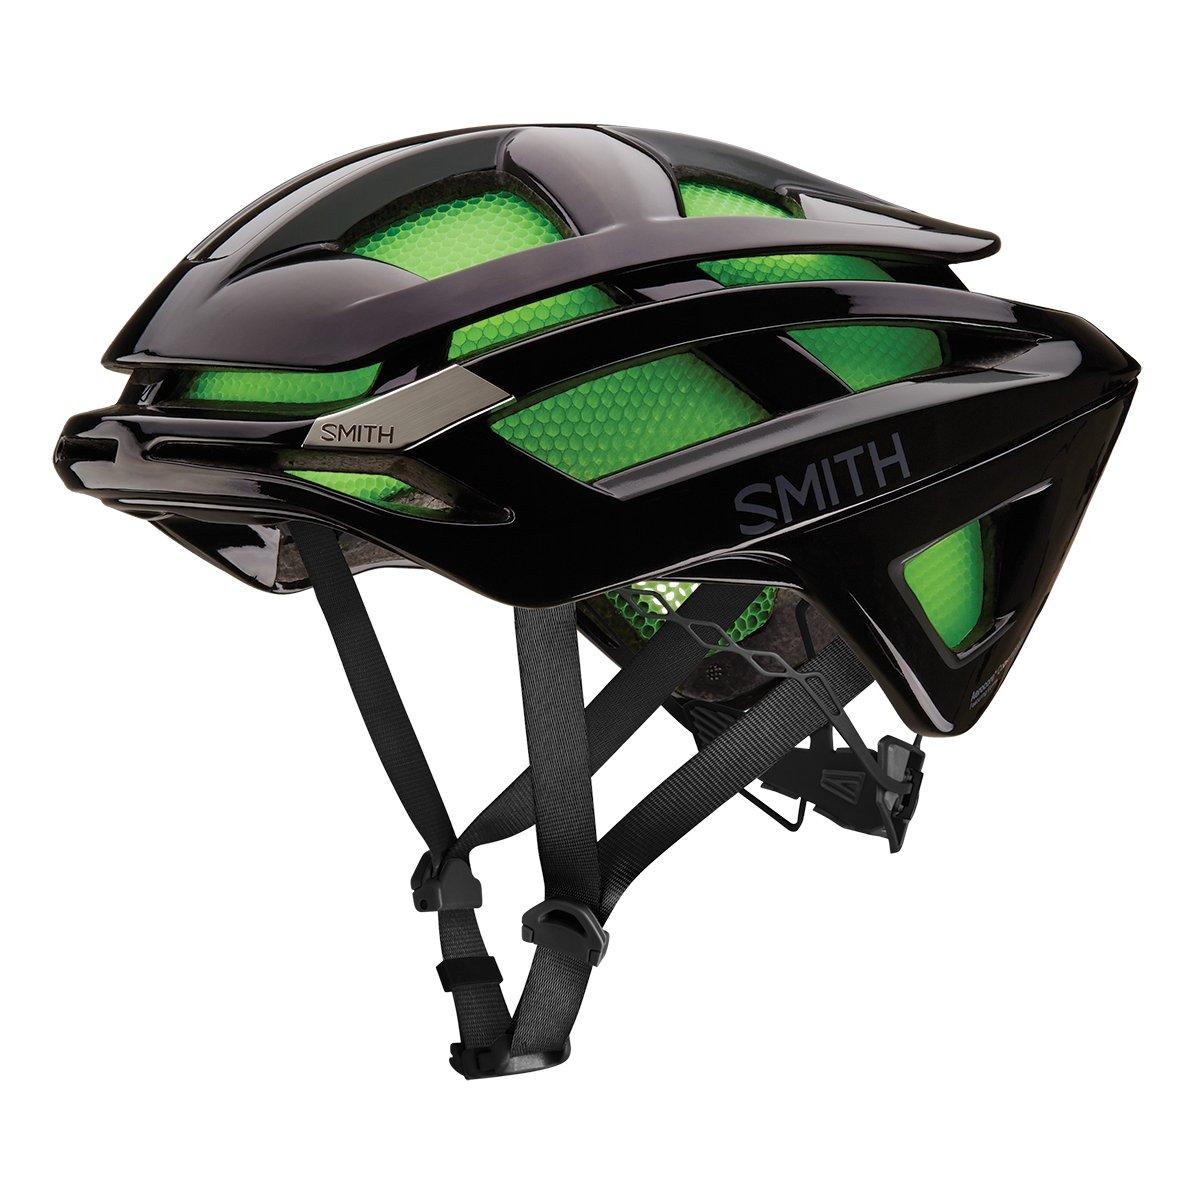 Smith Optics Cycling Helmet Overtake Mips Black Size Small